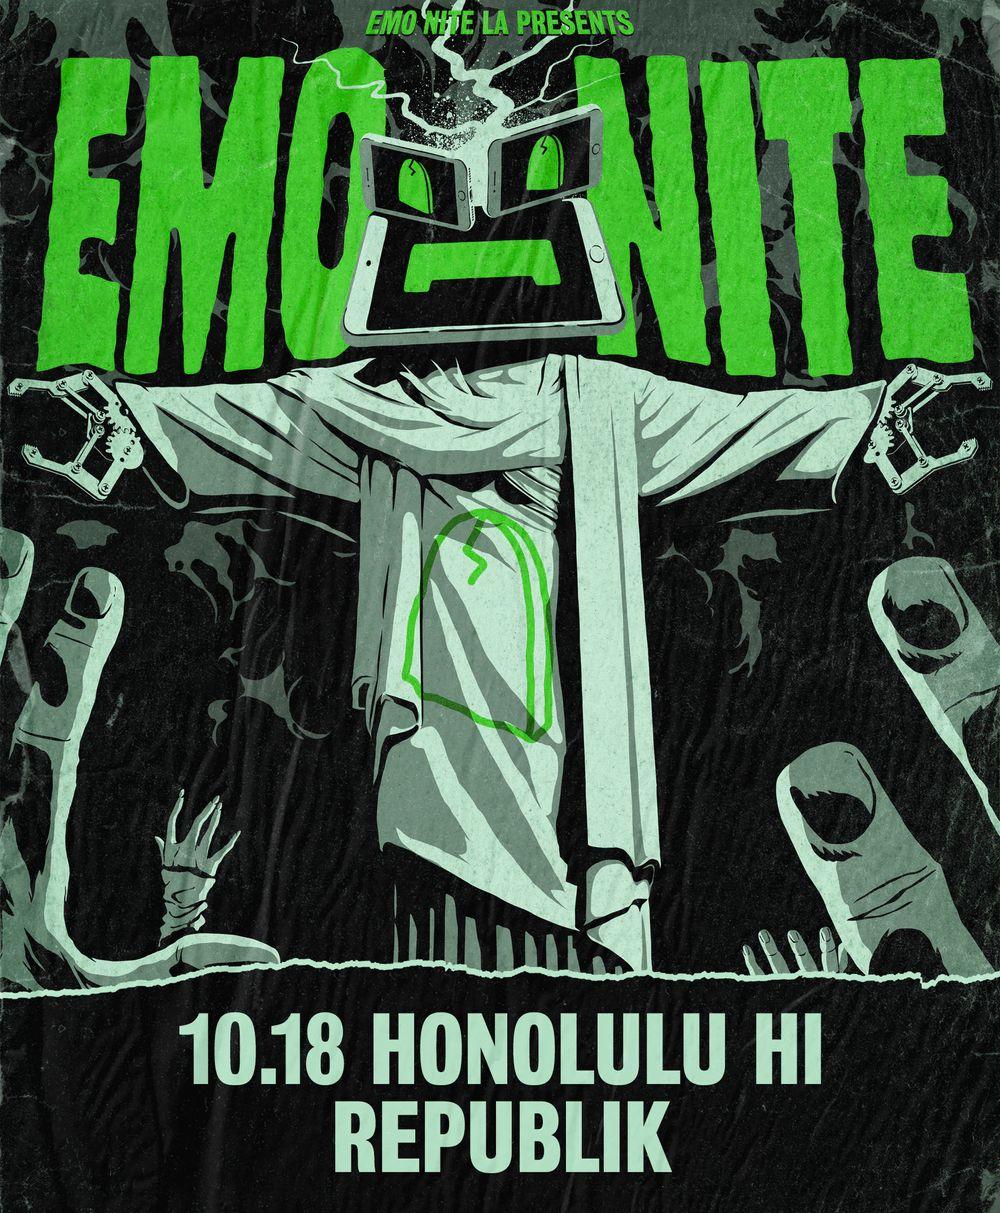 10-18 Honolulu 4x5.jpg